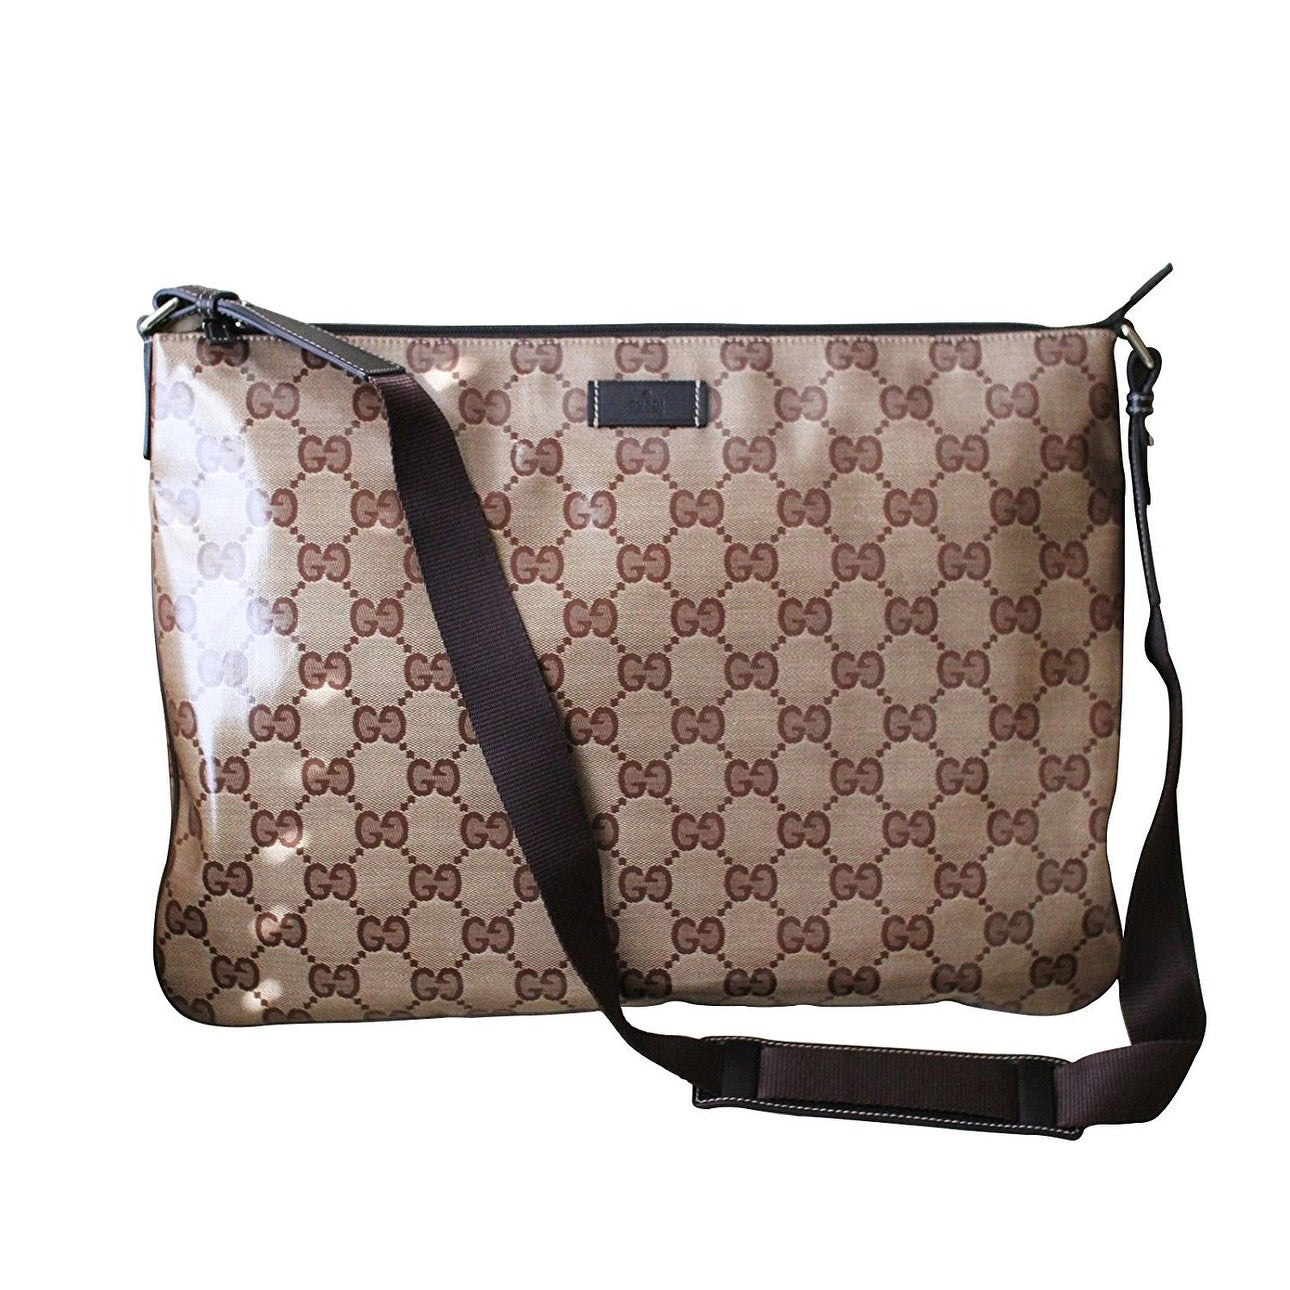 c9b039693 Designer Handbags | Find Great Designer Store Deals Shopping at Overstock